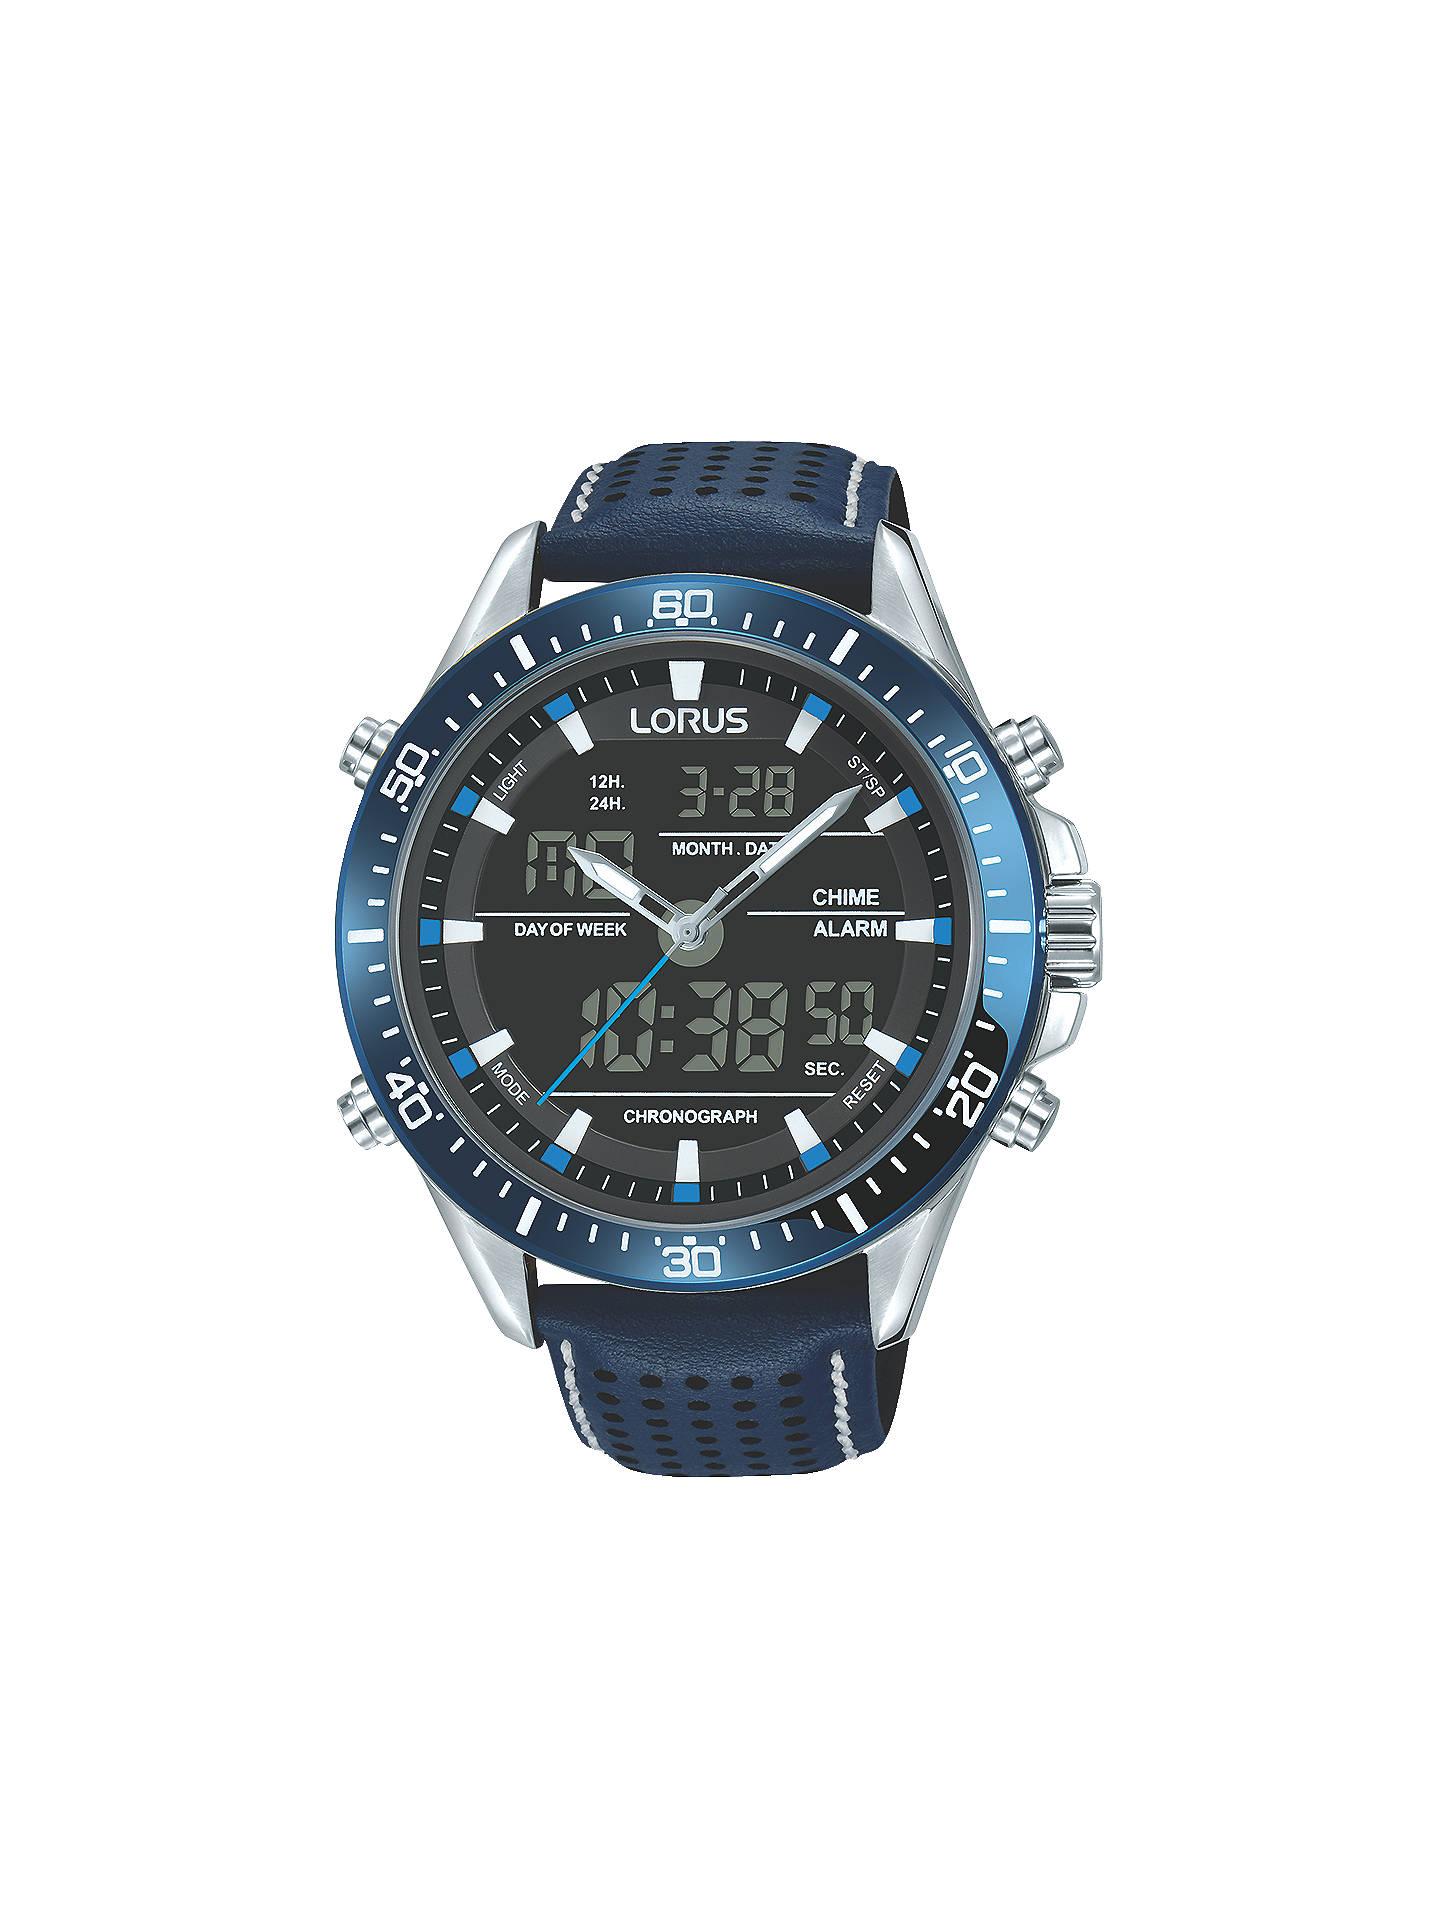 Lorus RW643AX9 Men's Analogue/Digital Chronograph Sports Leather Strap Watch - £45 + del @ John Lewis